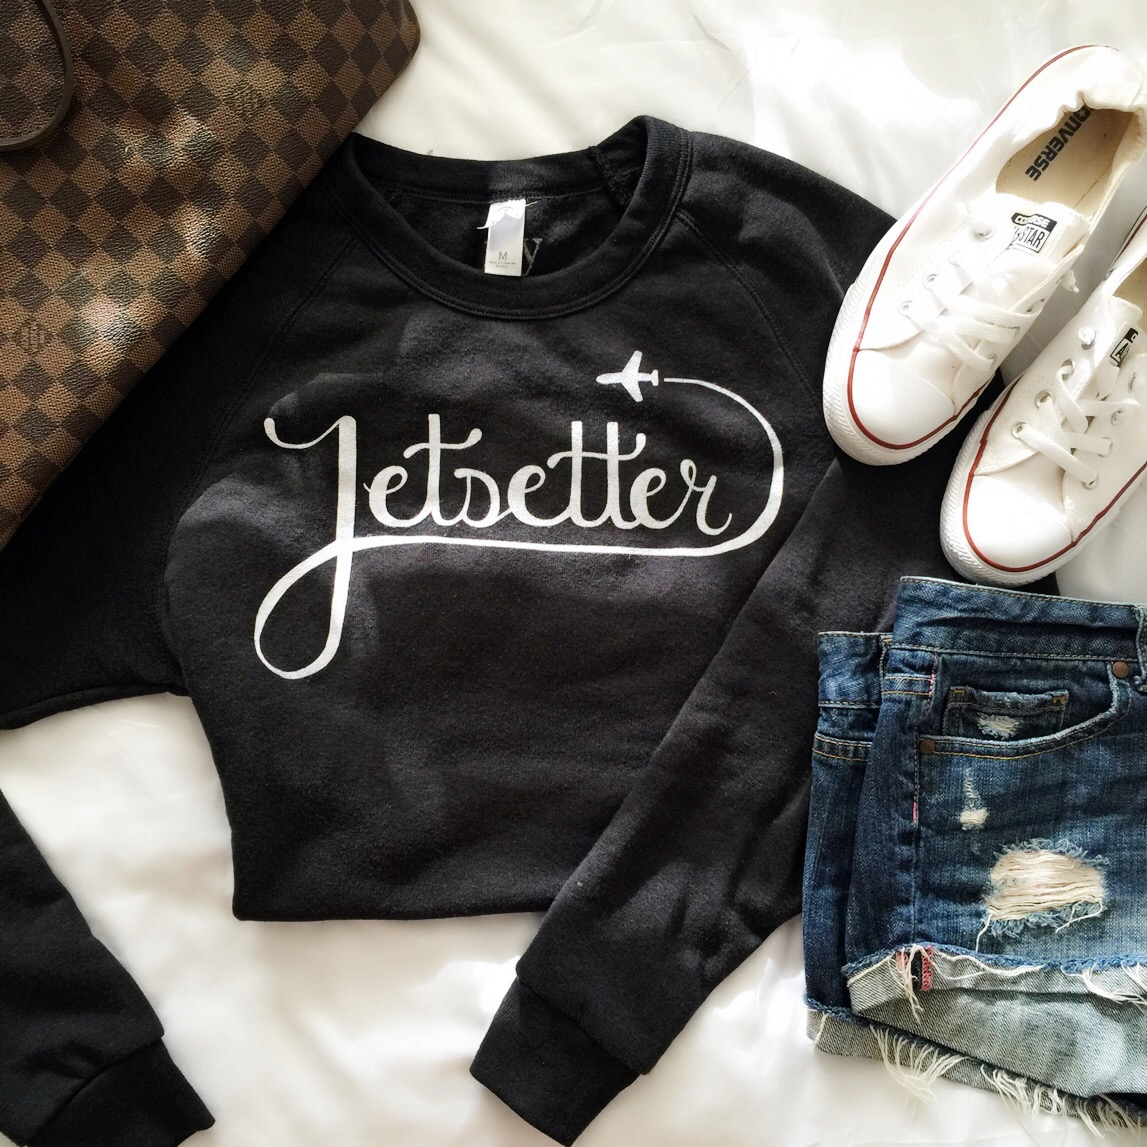 ily couture jetsetter sweatshirt